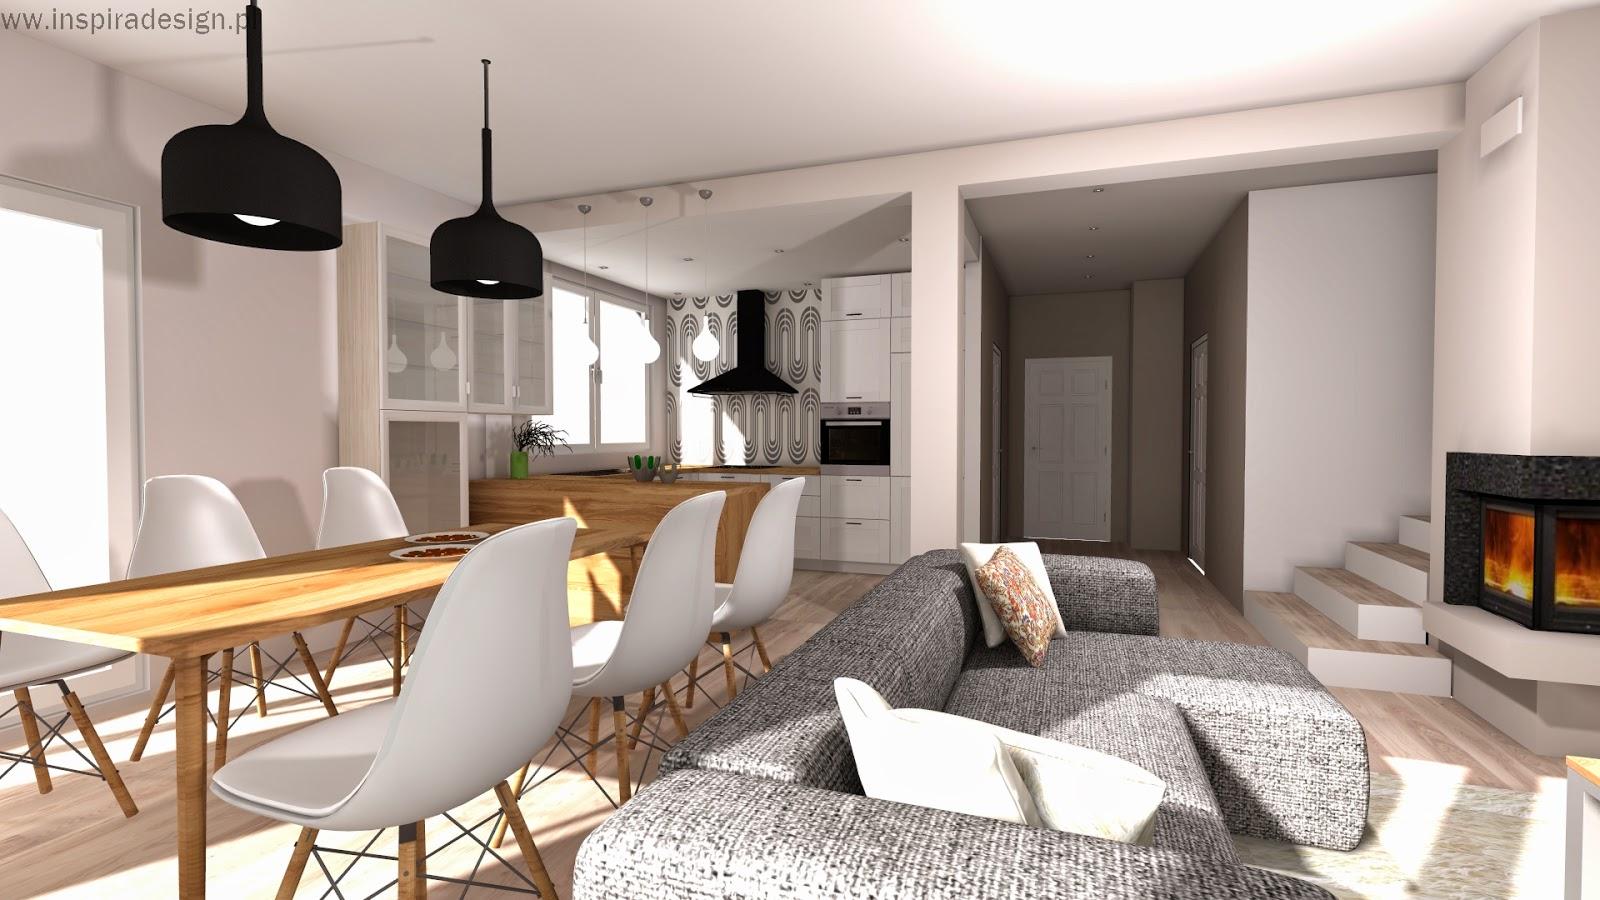 Projekt kuchni i salonu najlepszy pomys na for Projekty kuchni z salonem